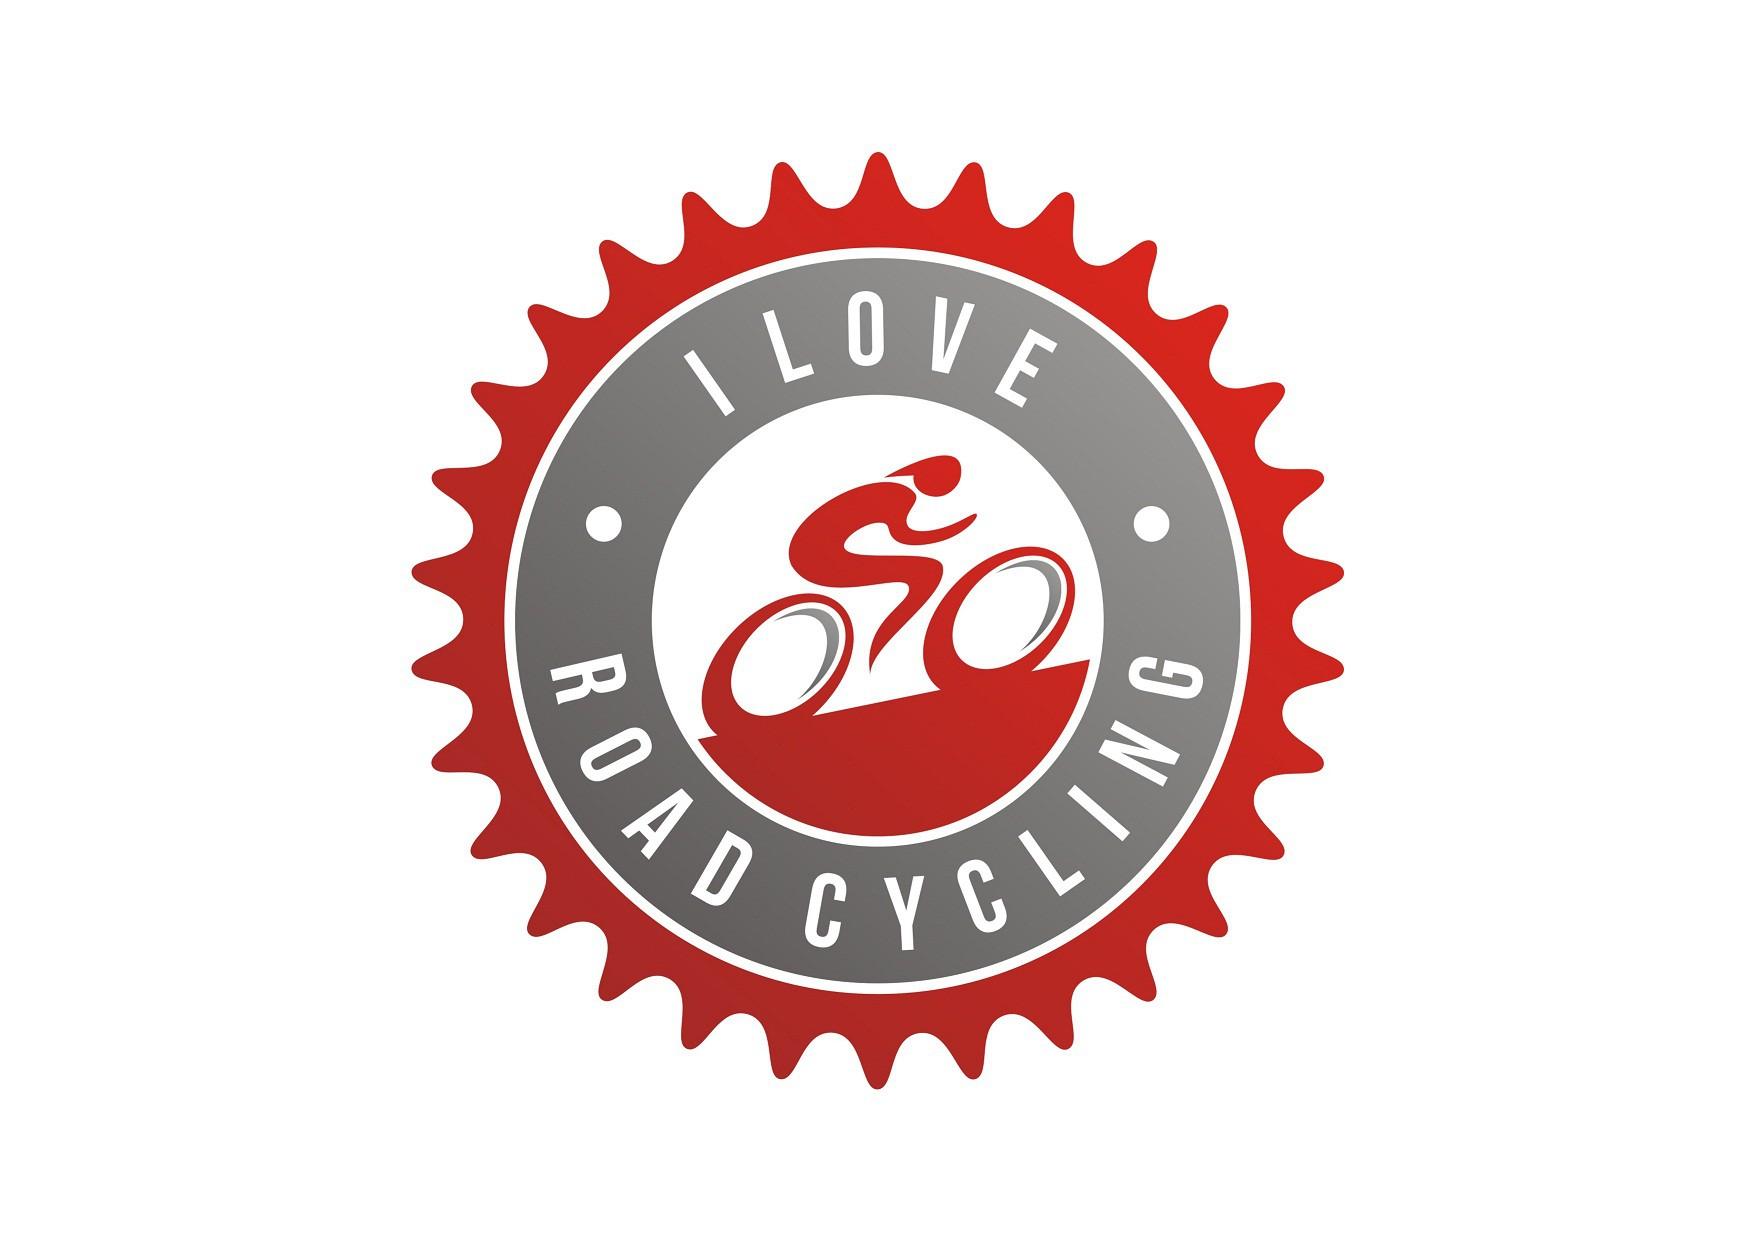 Create a modern, flexible logo for road cycling fans